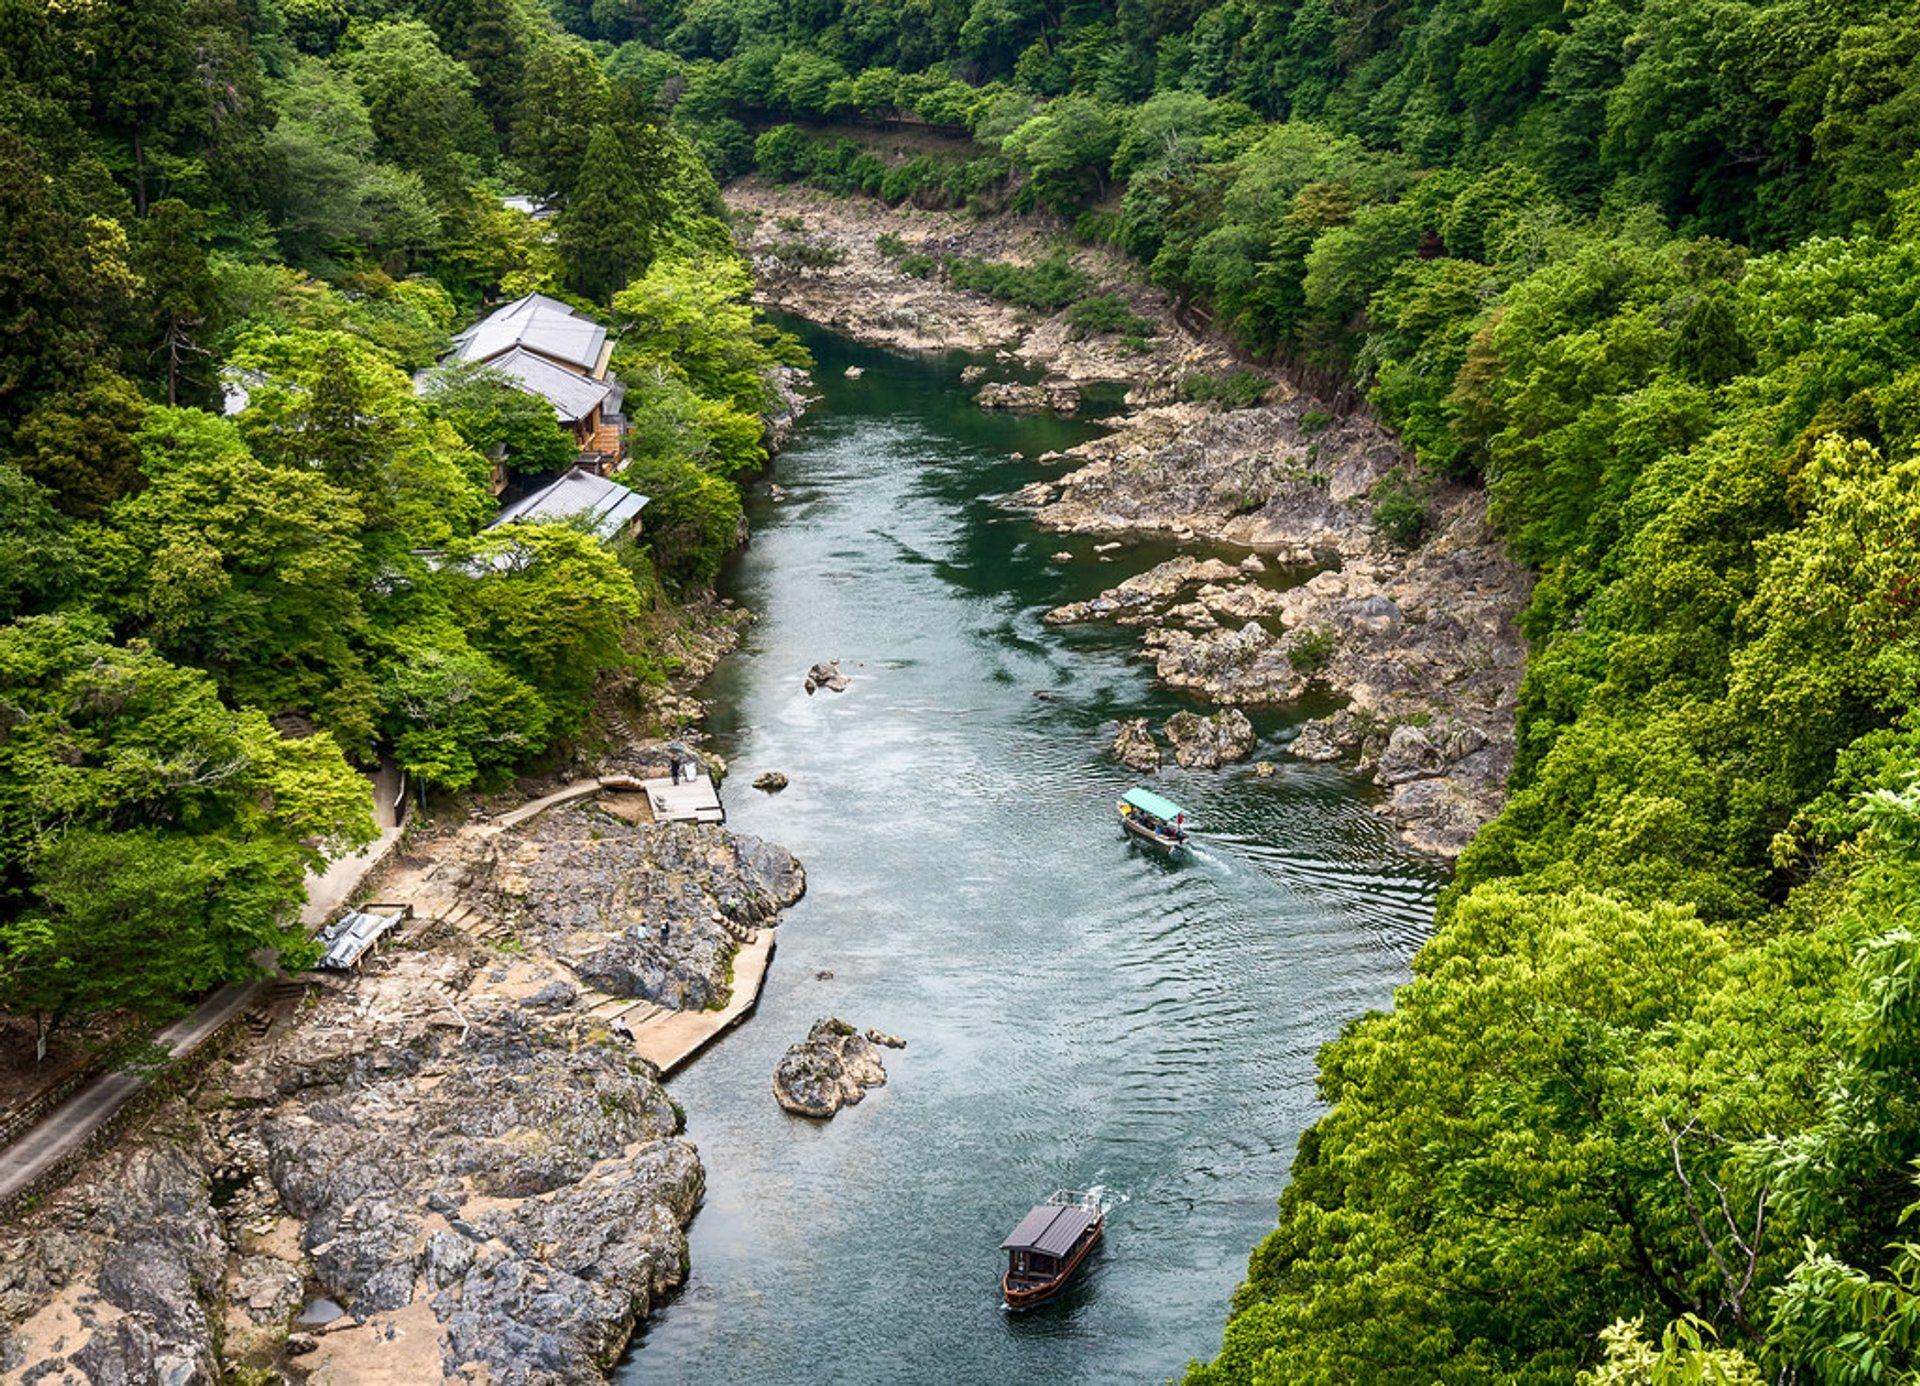 Hozu-Gawa River Boat Ride in Kyoto - Best Season 2020